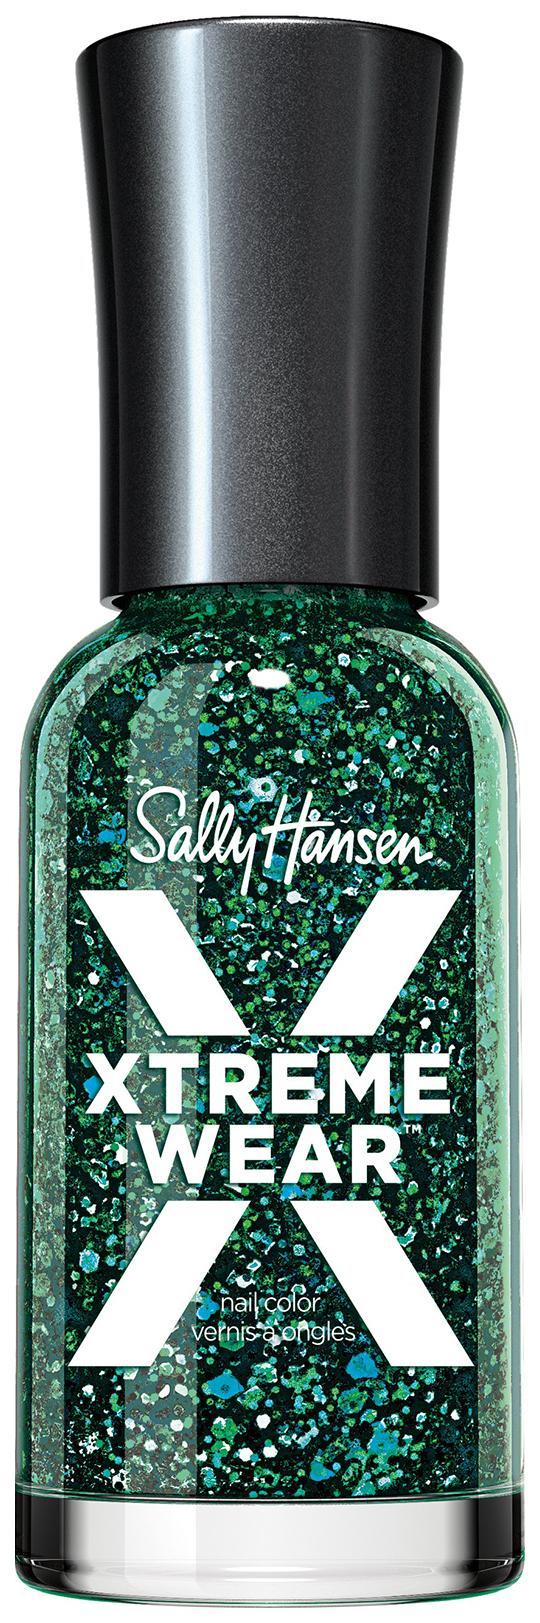 Лак для ногтей Sally Hansen Xtreme Wear Nail Color 366 Fanta-seas 11,8 мл